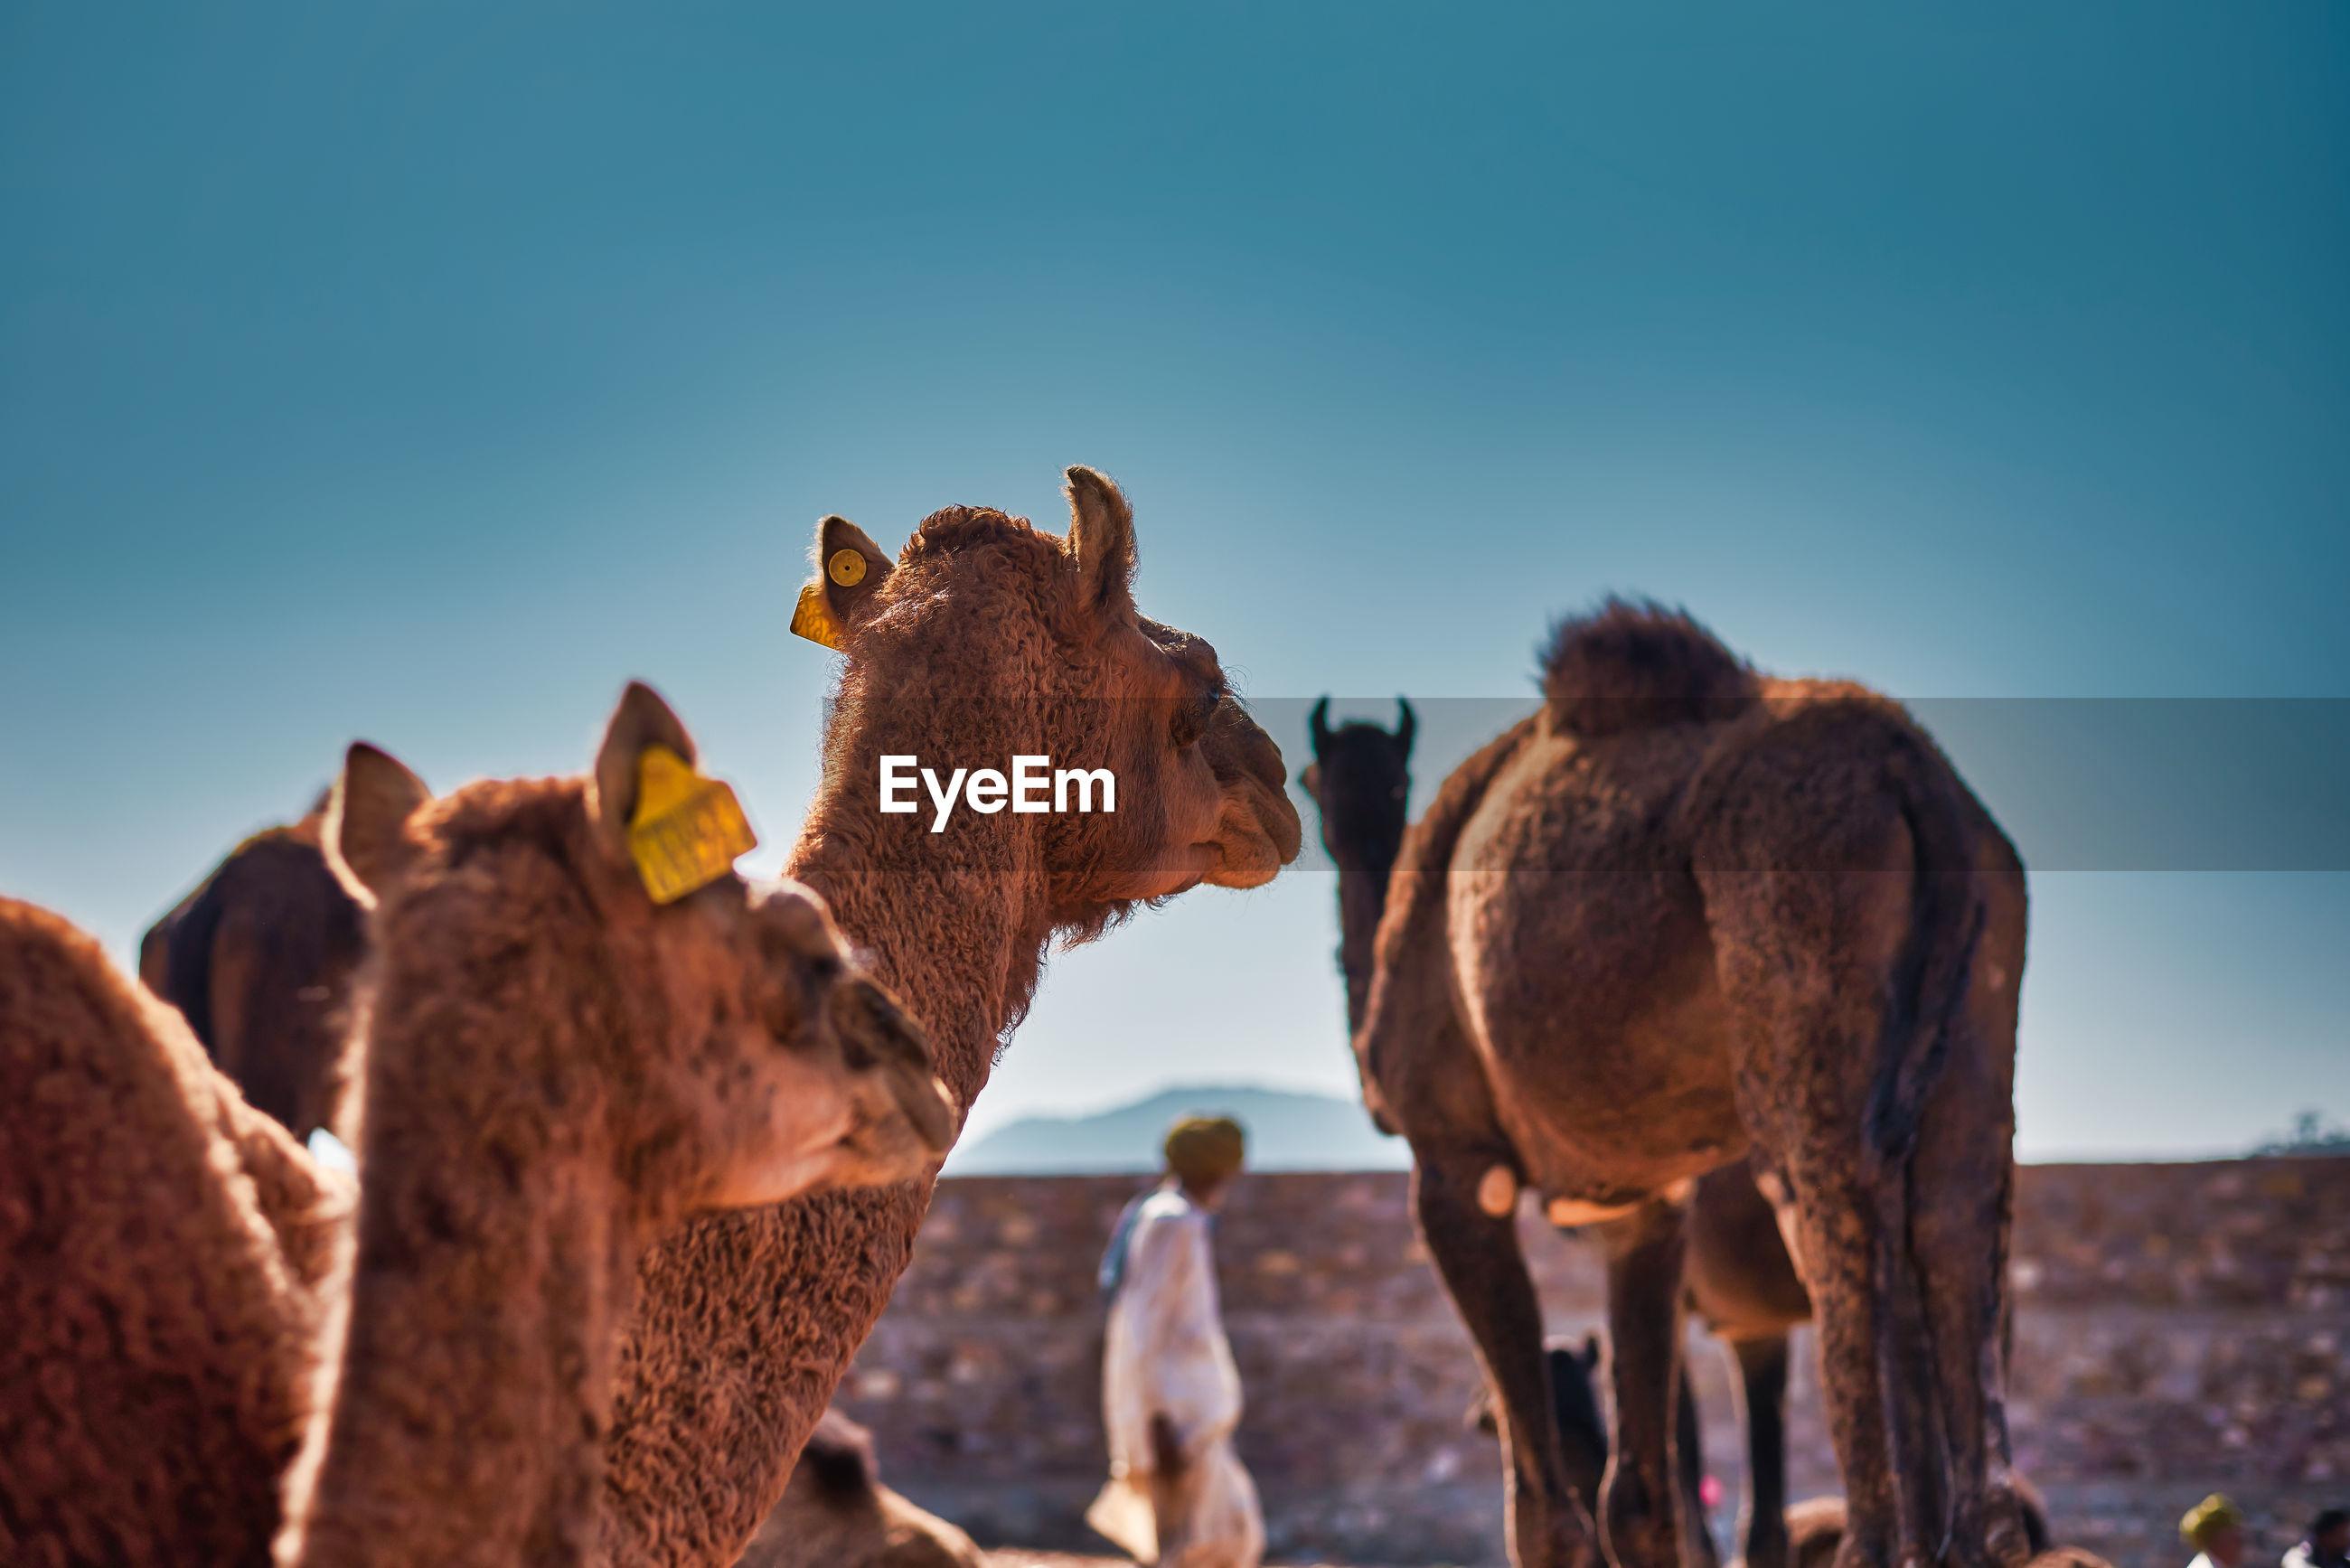 A man between camels in pushkar animal fair